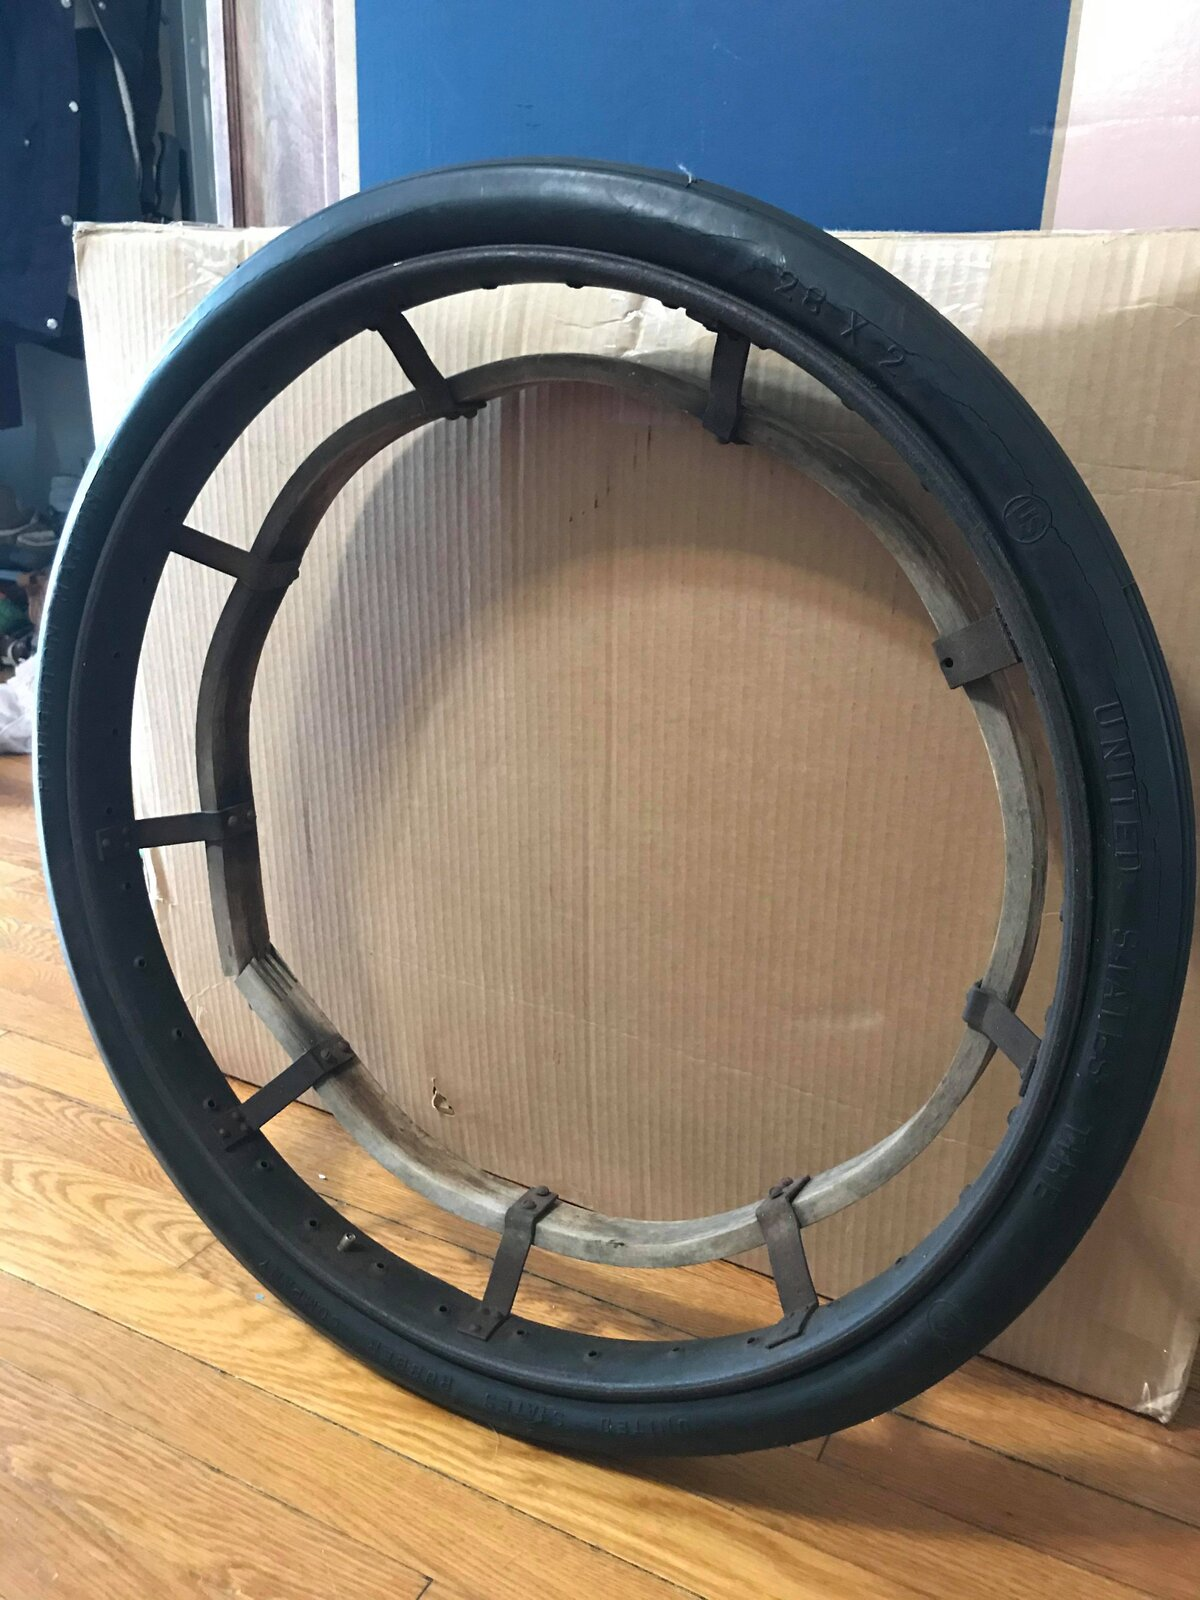 sheaved wheel with tire.jpg